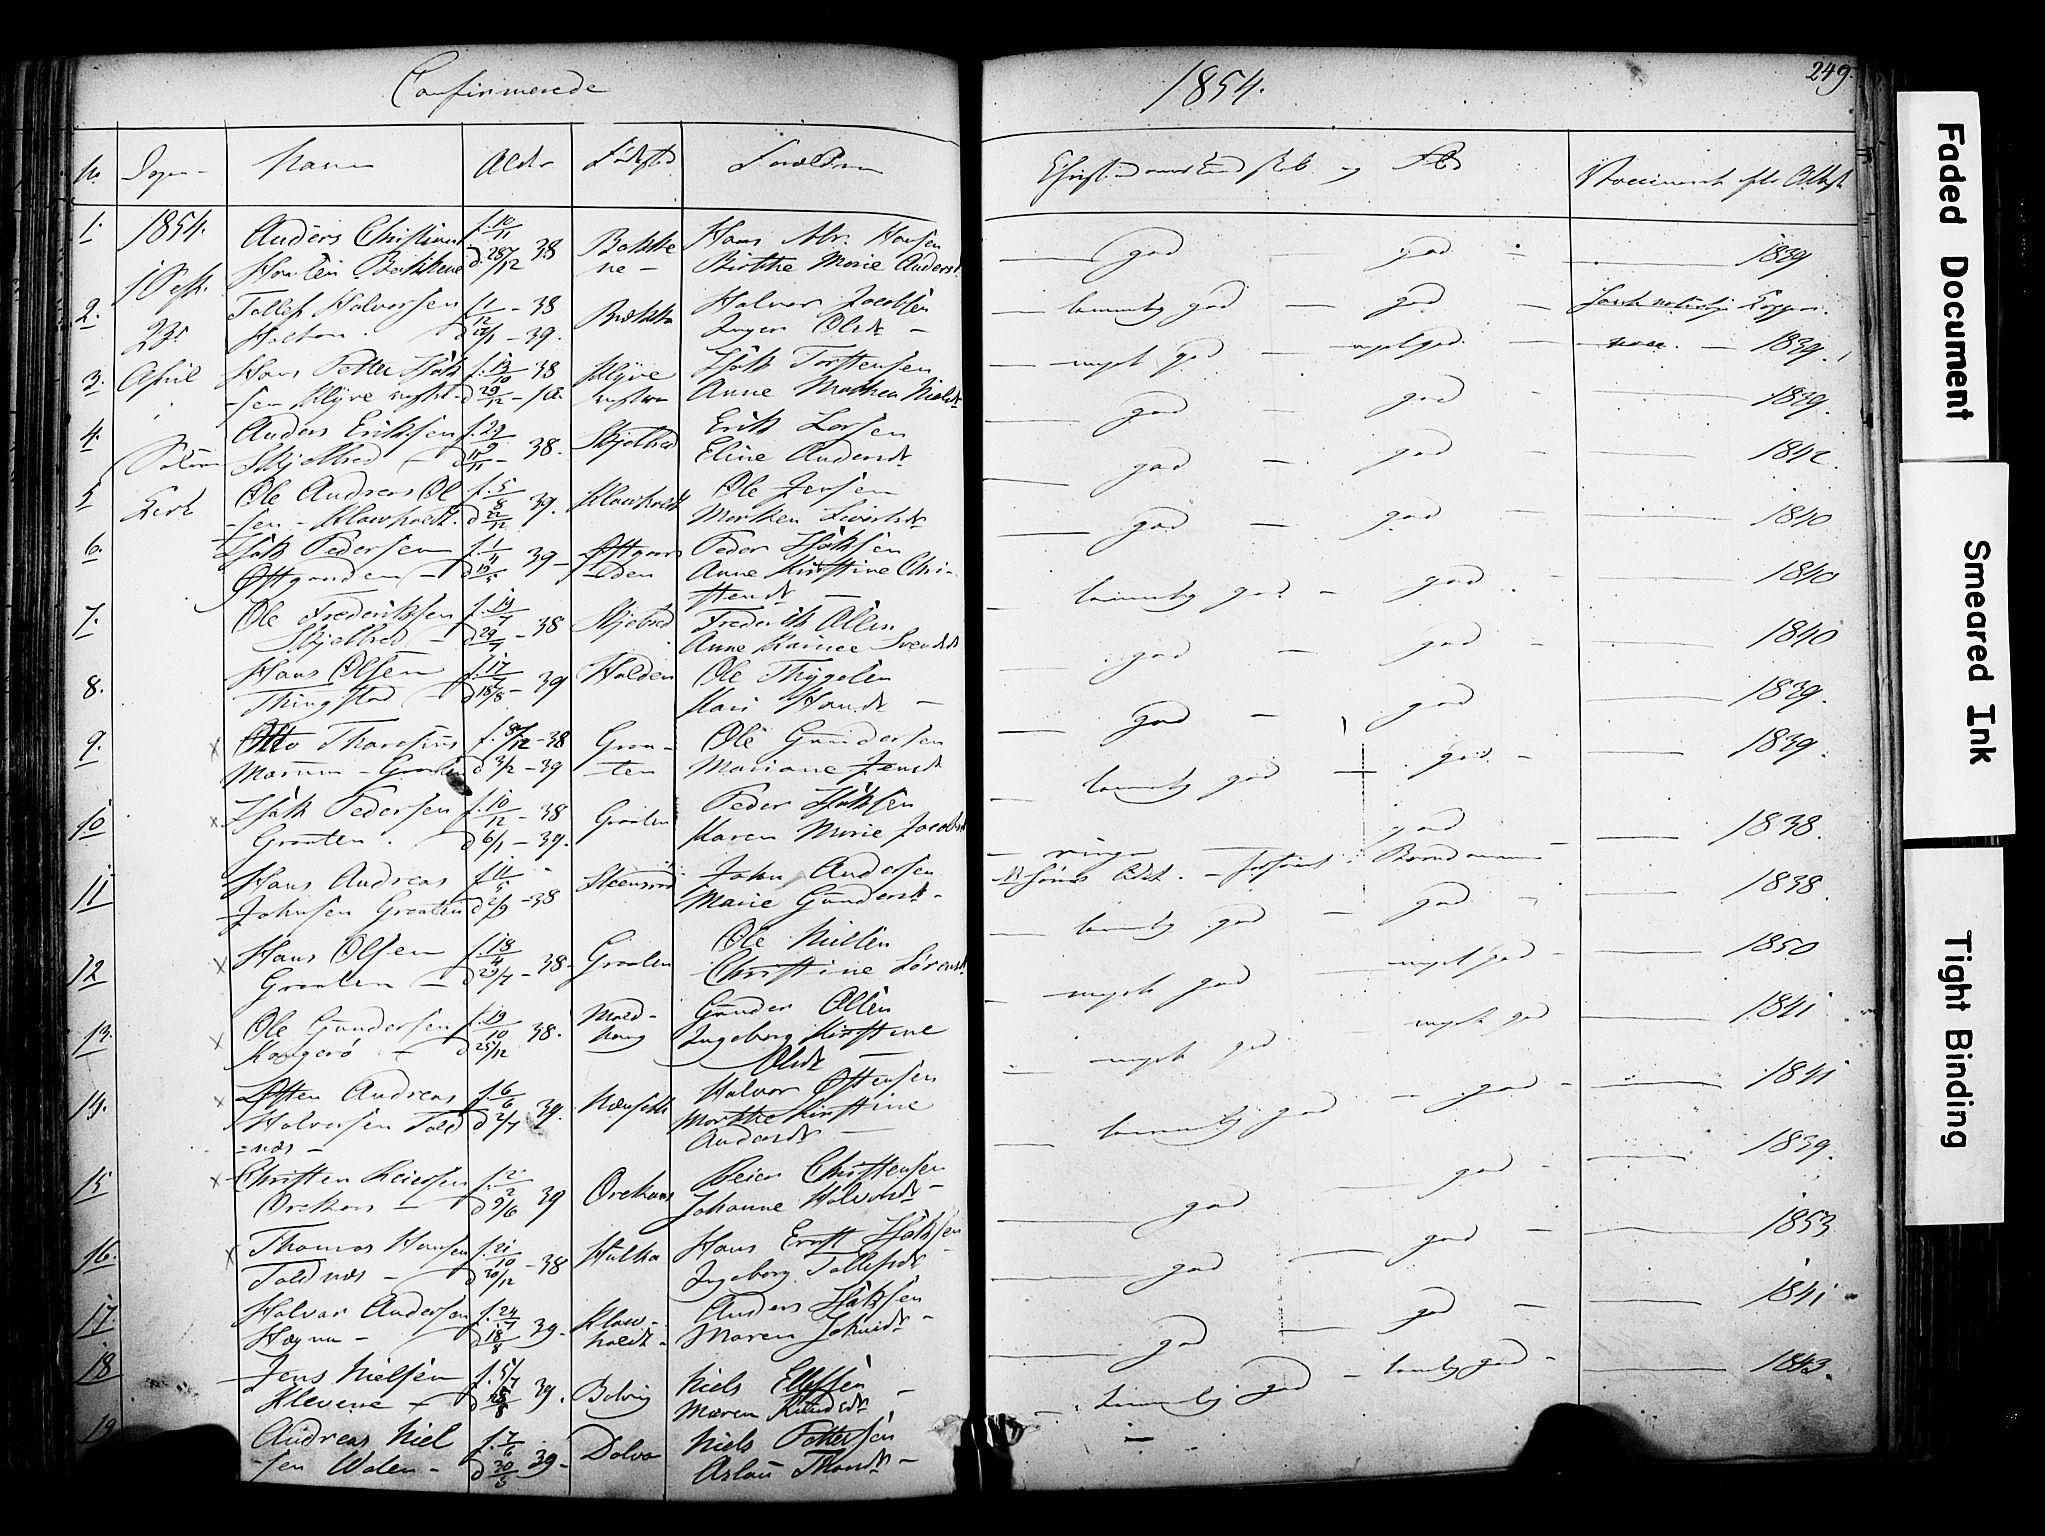 SAKO, Solum kirkebøker, F/Fa/L0006: Ministerialbok nr. I 6, 1844-1855, s. 249